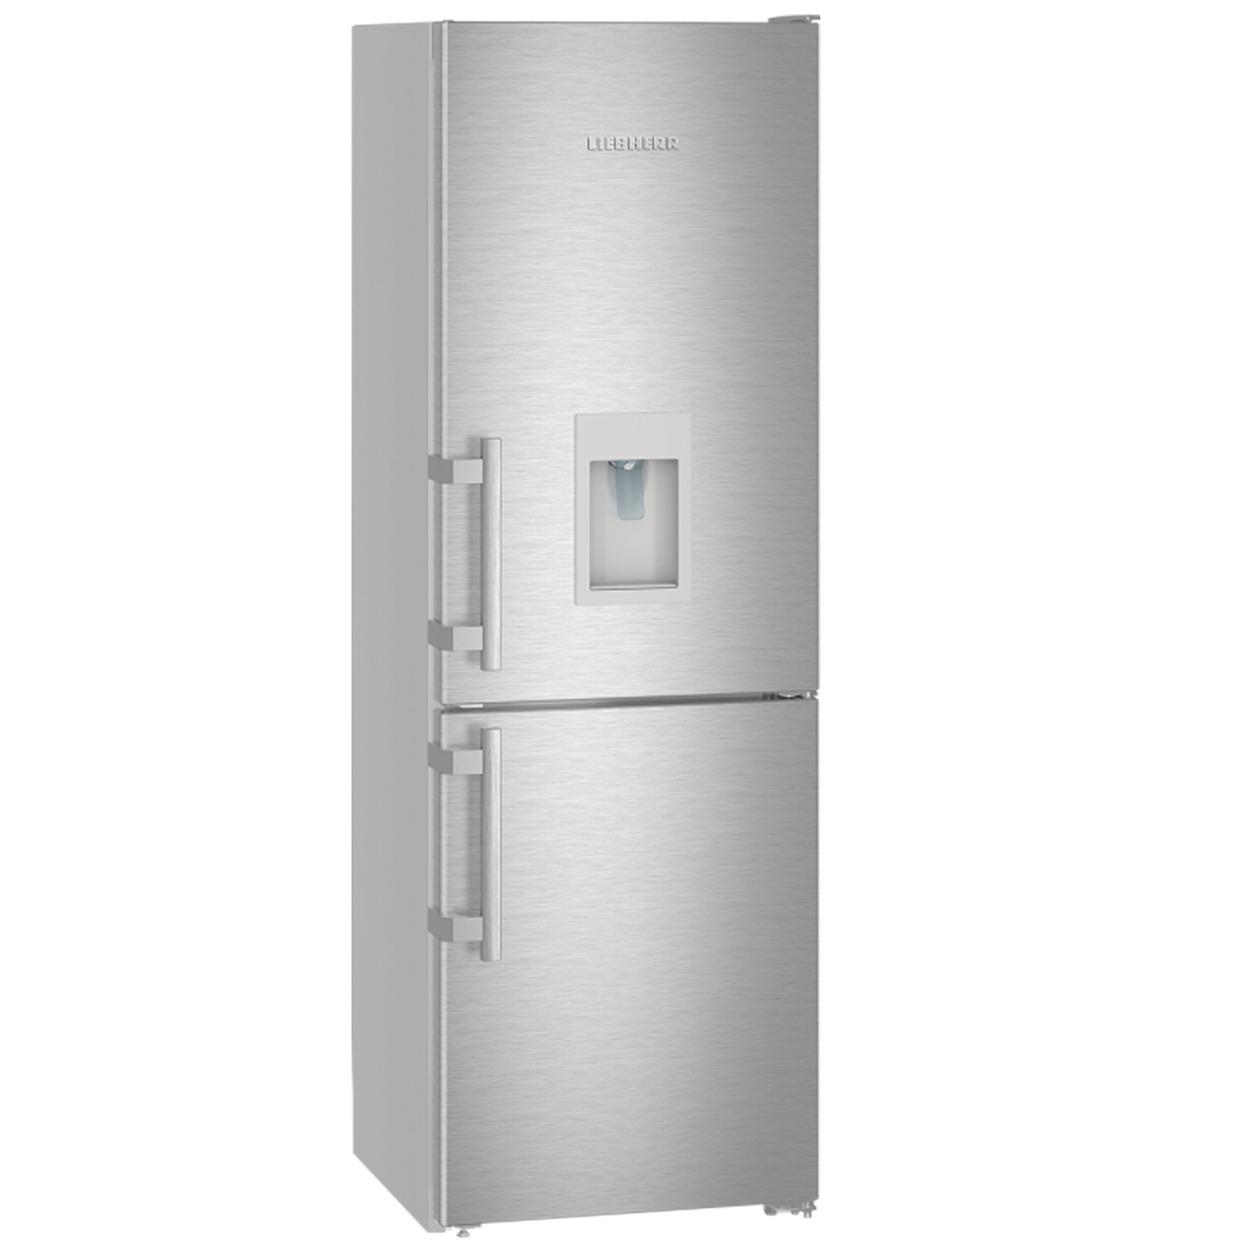 Liebherr koelkast met vriesvak CNef 3535-20 - Prijsvergelijk